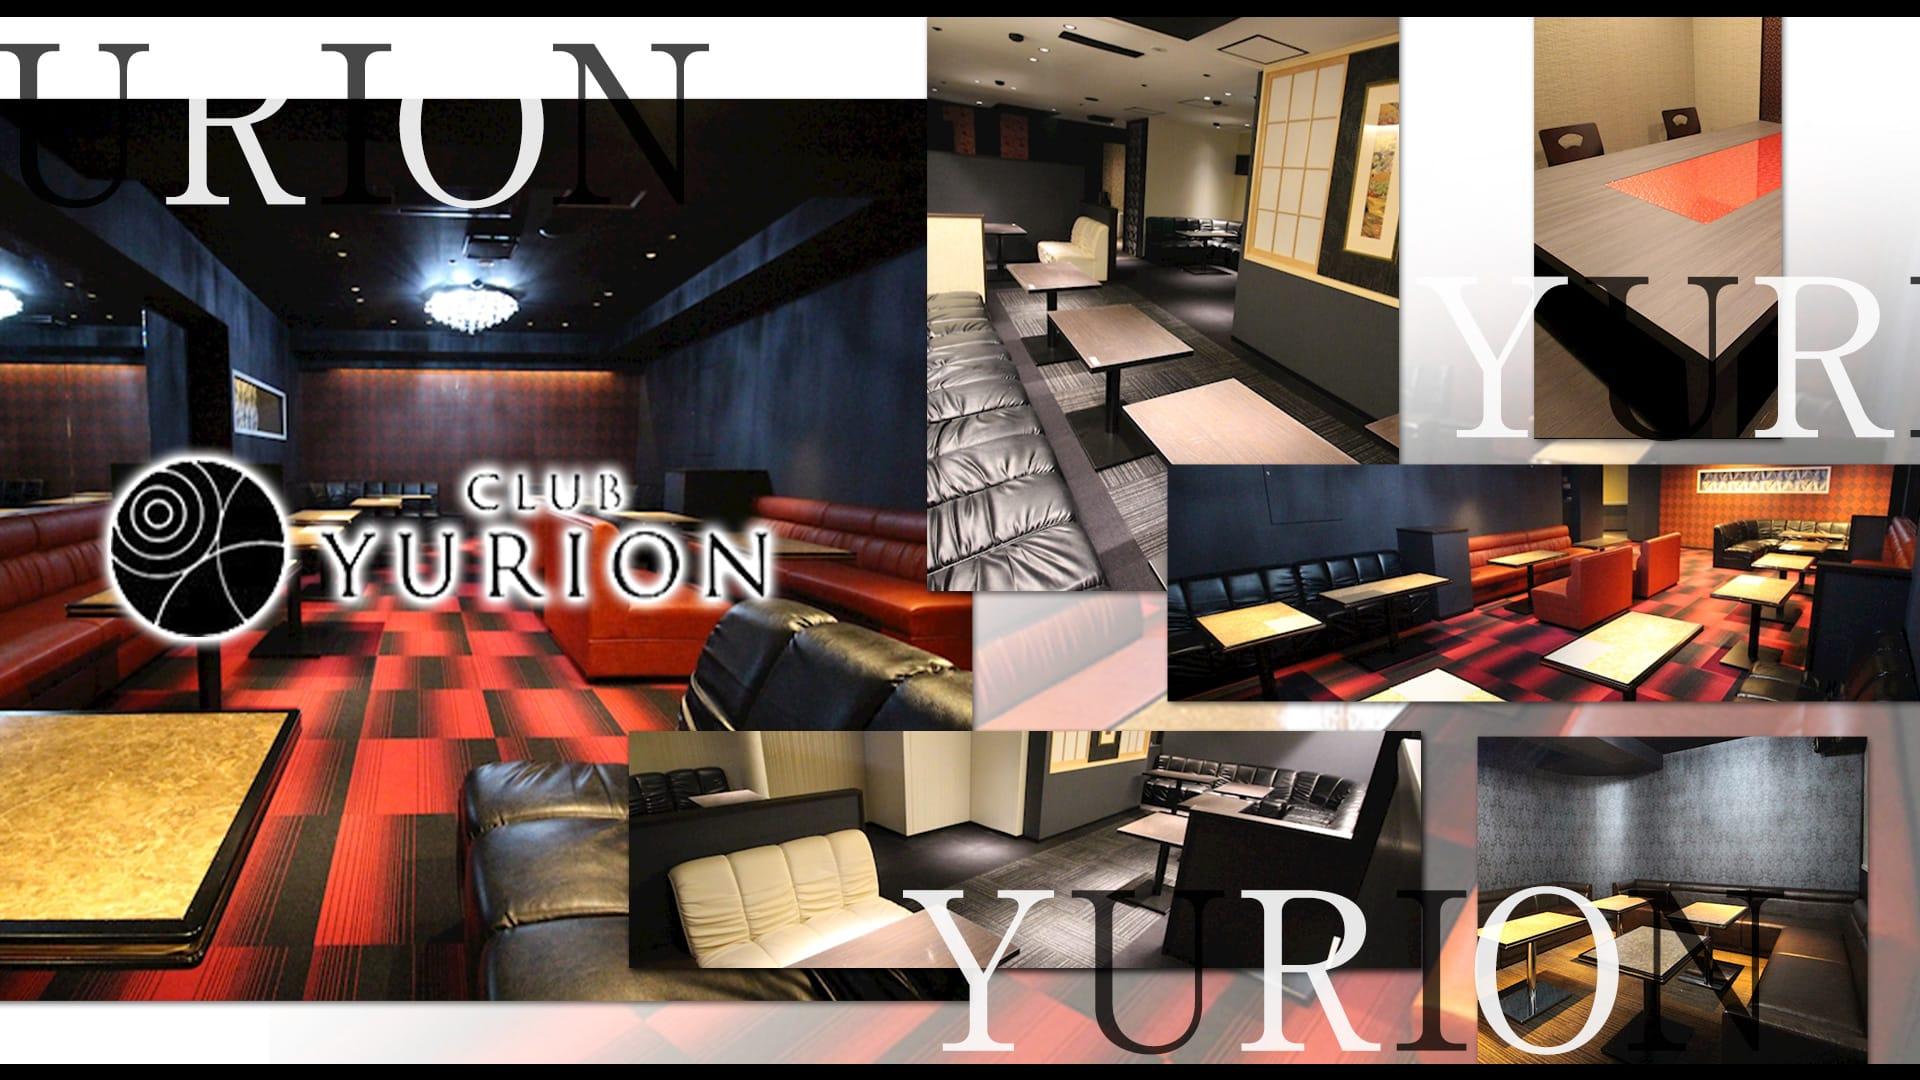 CLUB YURION (ユリオン) 祇園キャバクラ TOP画像